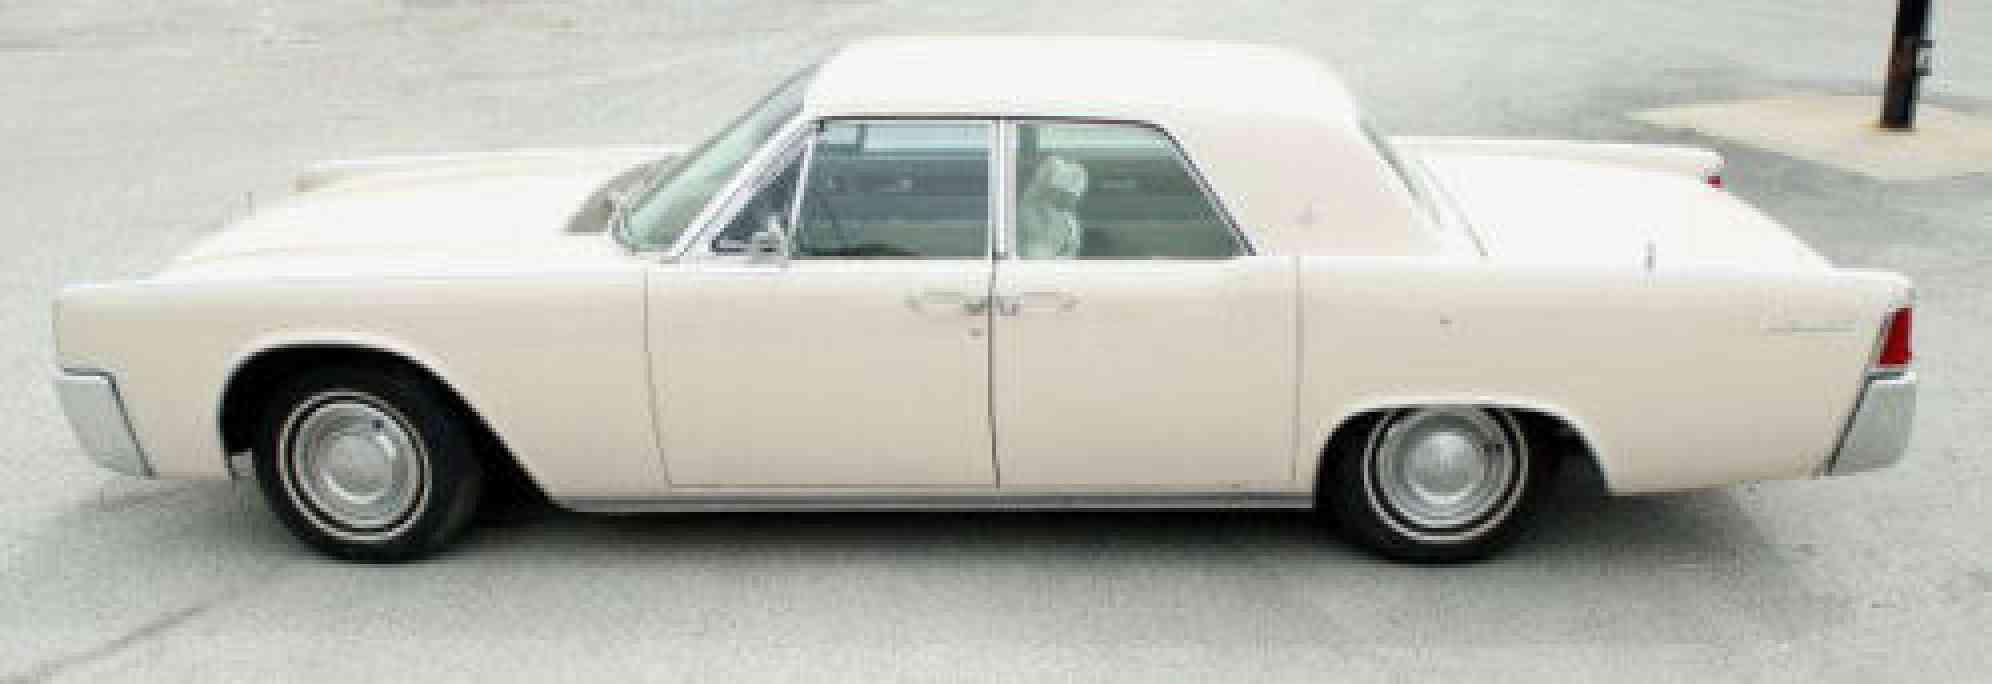 lincoln continental 1961 430 cid v 8 engine automatic. Black Bedroom Furniture Sets. Home Design Ideas